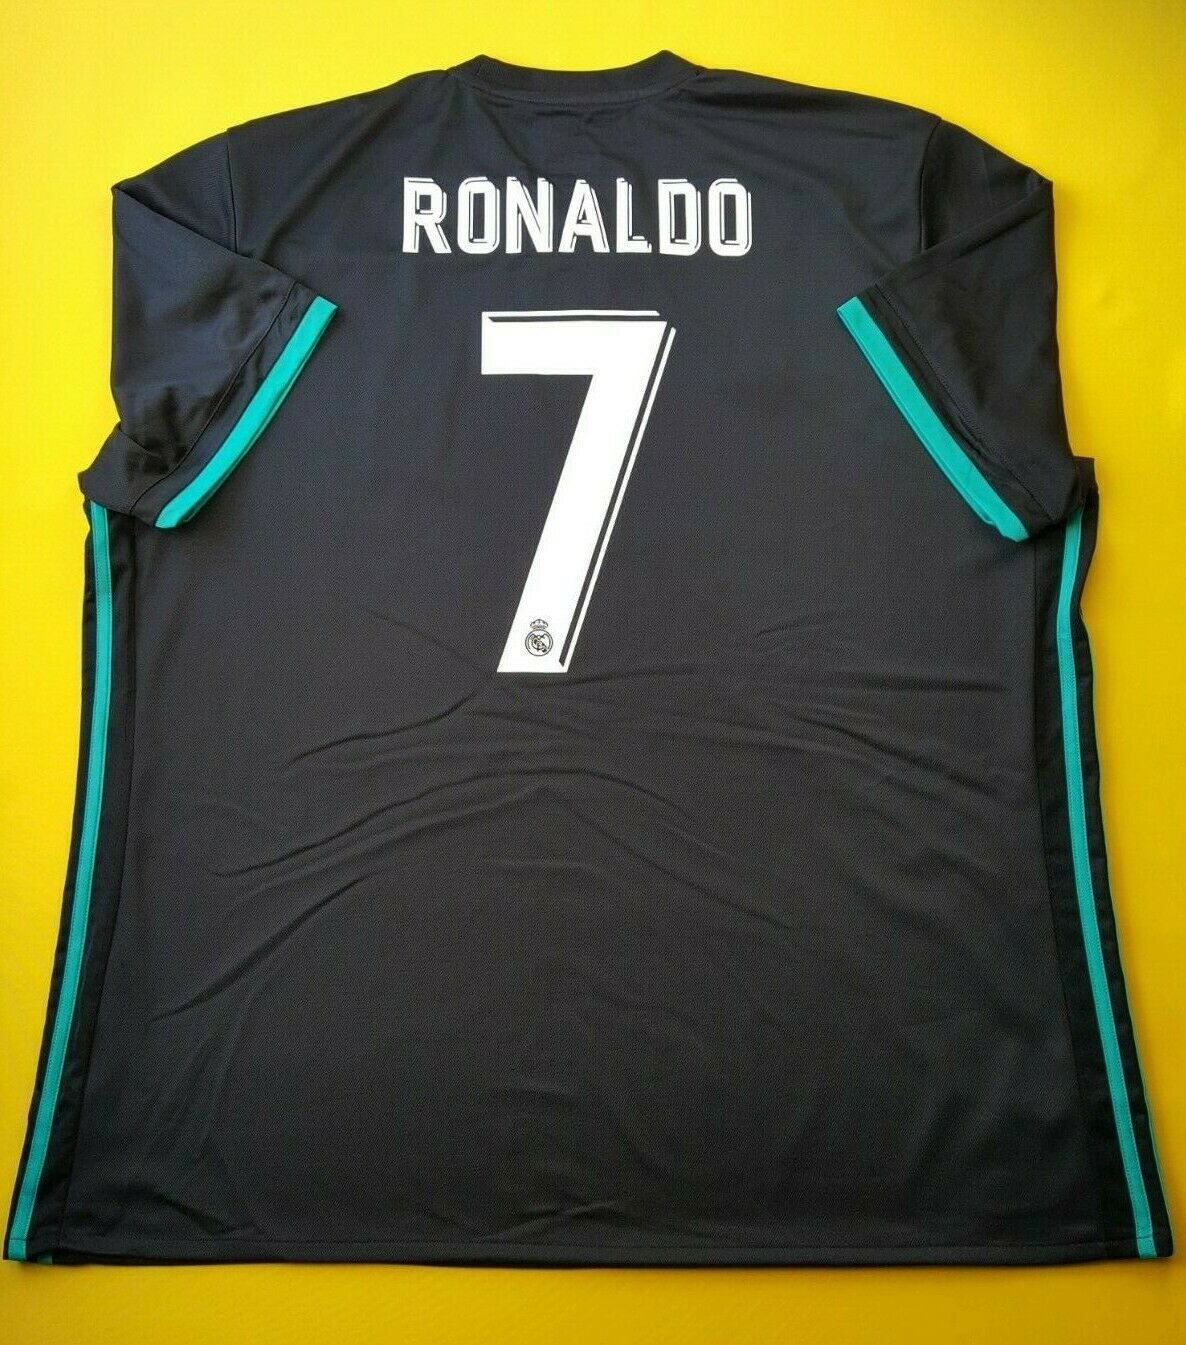 4.9 5 Ronaldo Real Madrid Jersey Camisa De Fútbol Adidas BR3543 2XL 2018 ig93